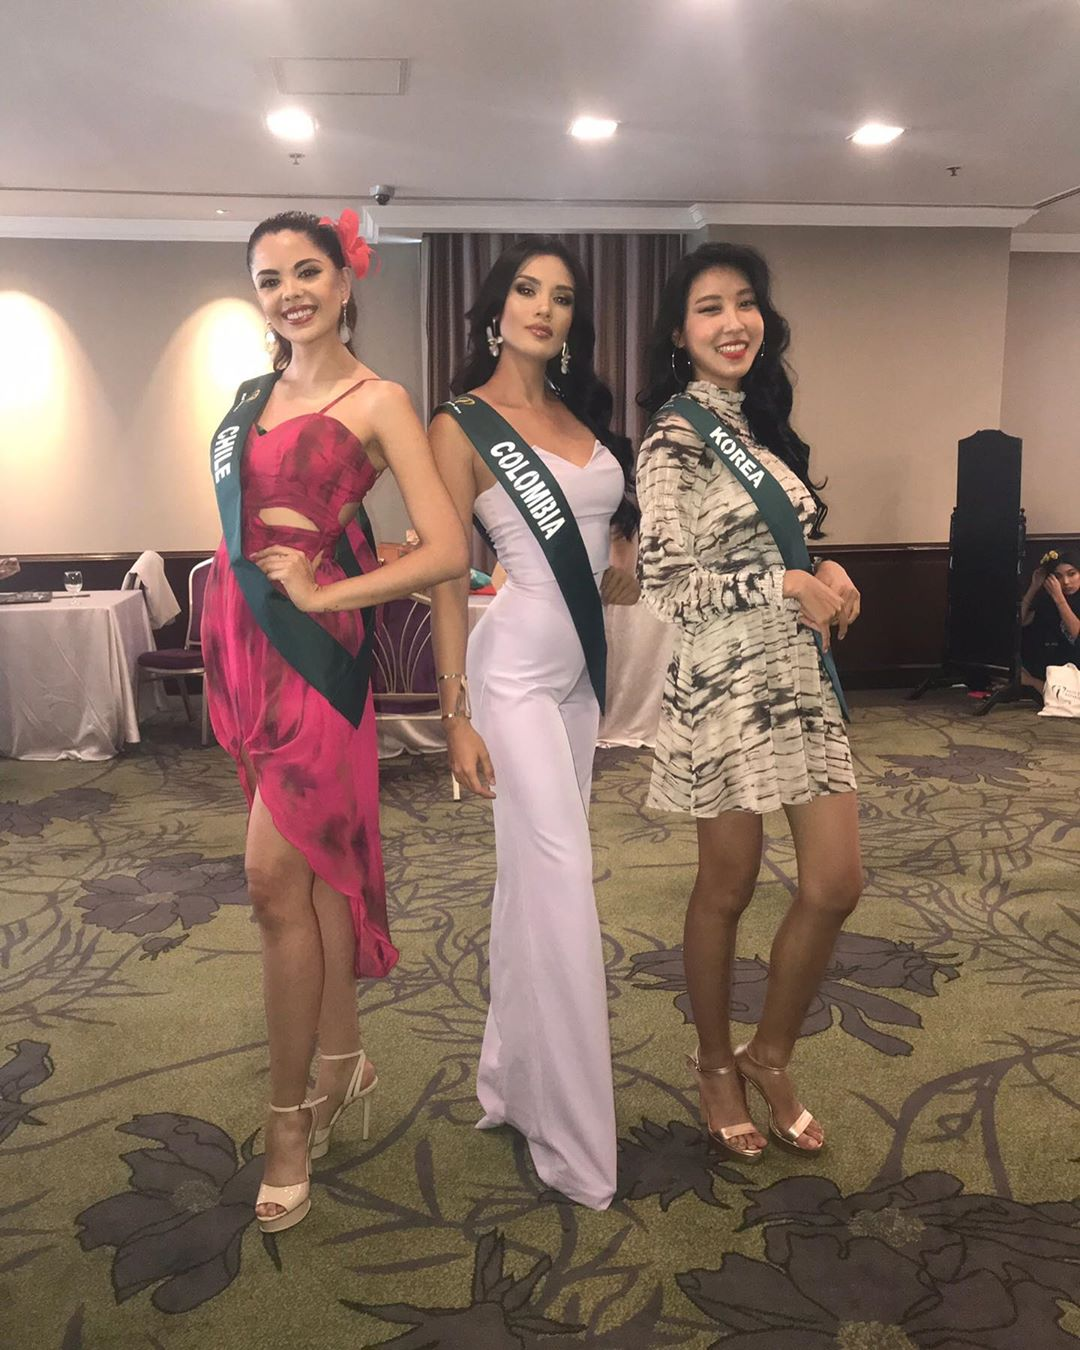 yenny katherine carrillo, top 20 de miss earth 2019/reyna mundial banano 2017. - Página 6 71285010